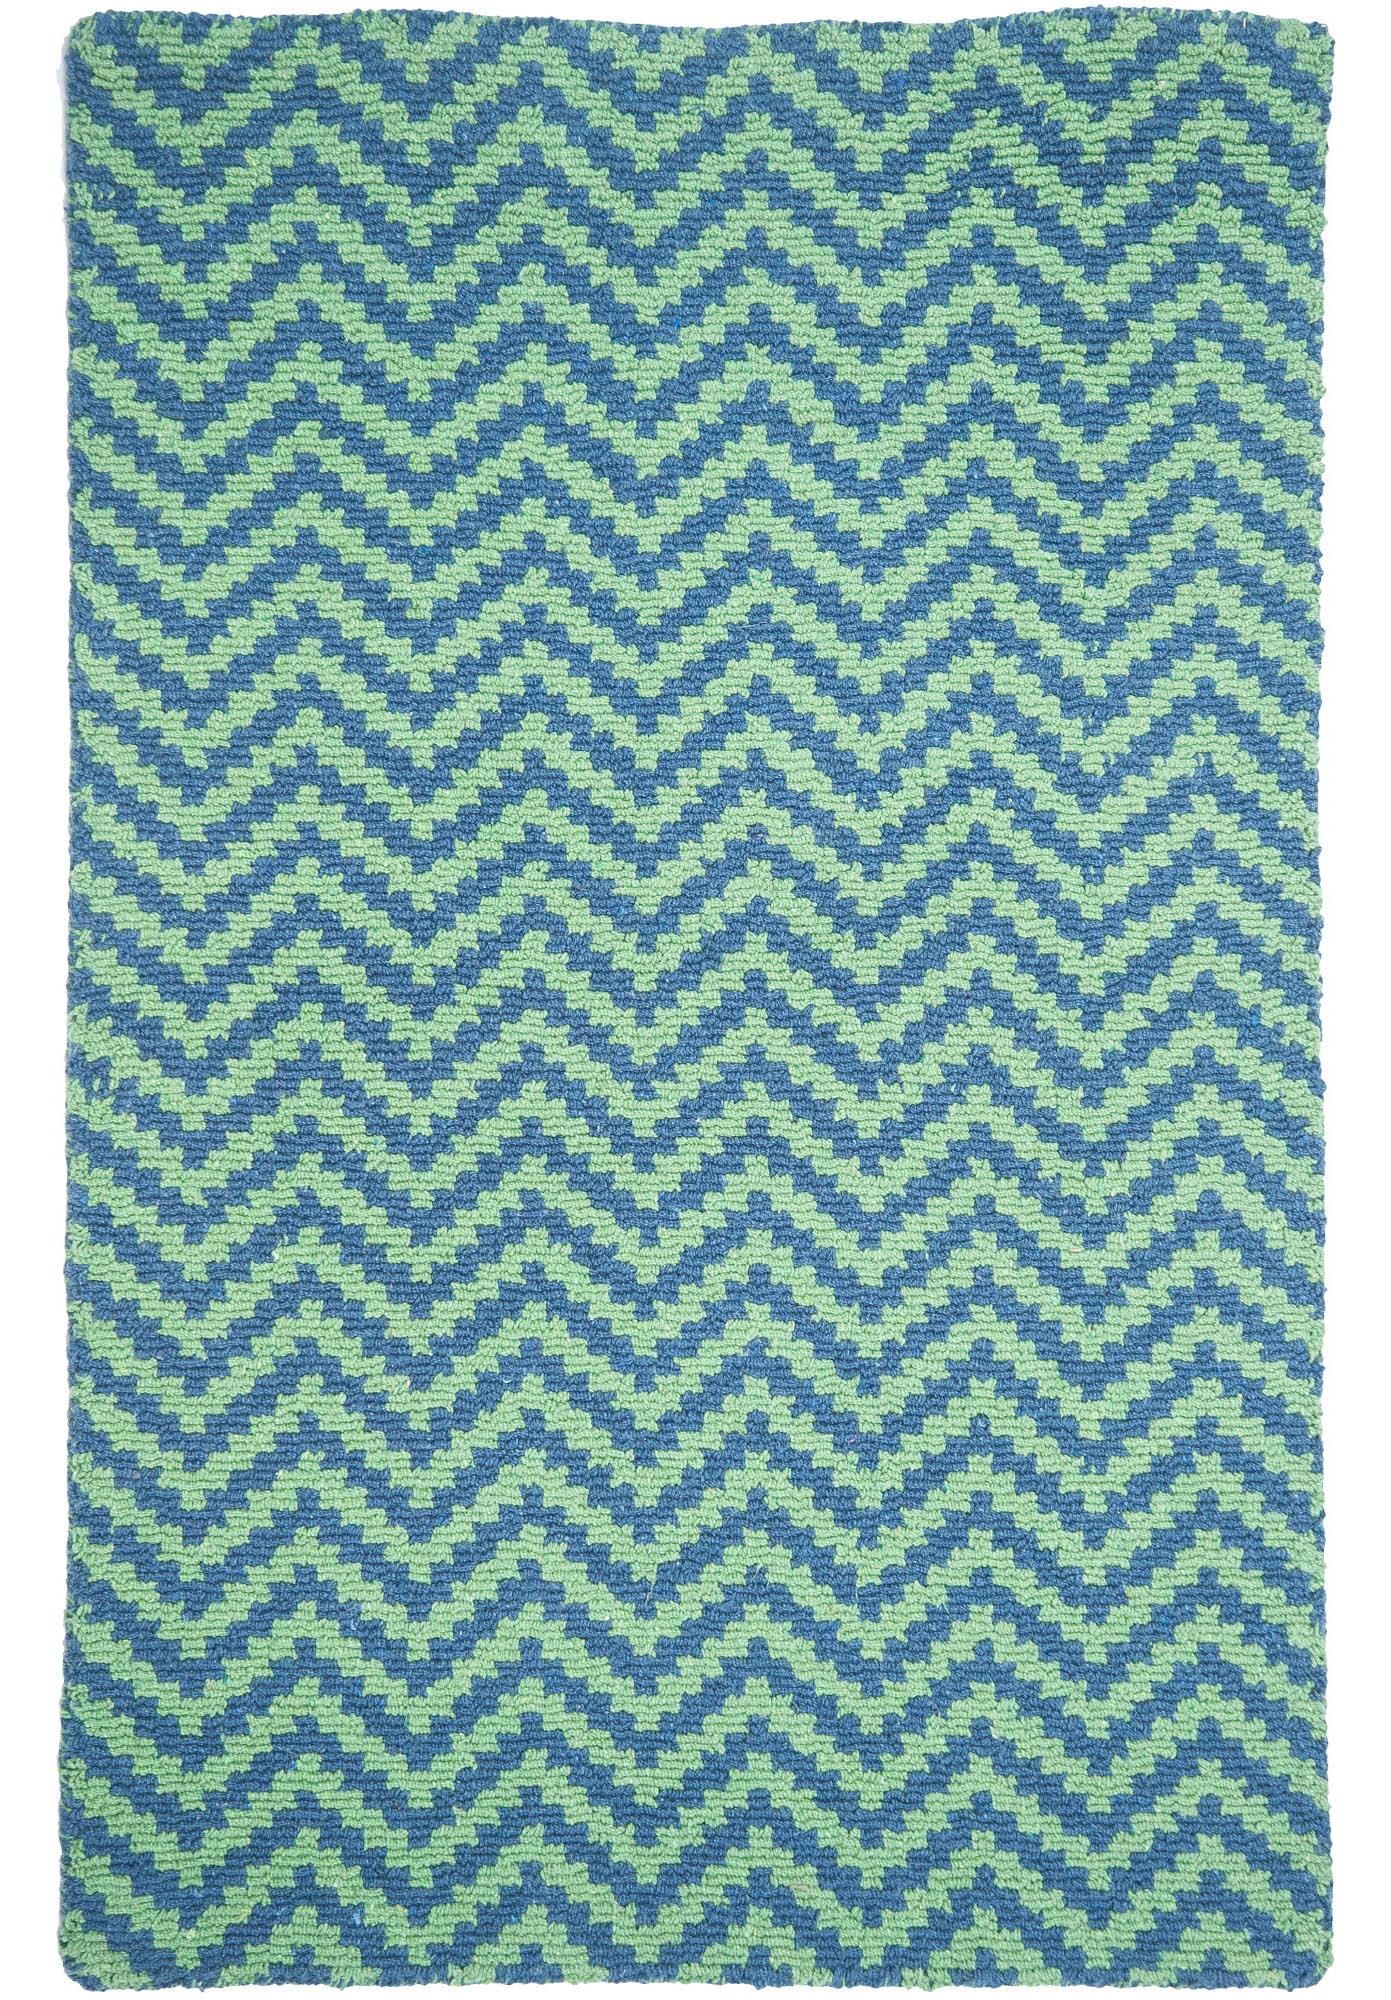 New Waves Blue Green Eco Cotton Loom Hooked Rug Hook Amp Loom